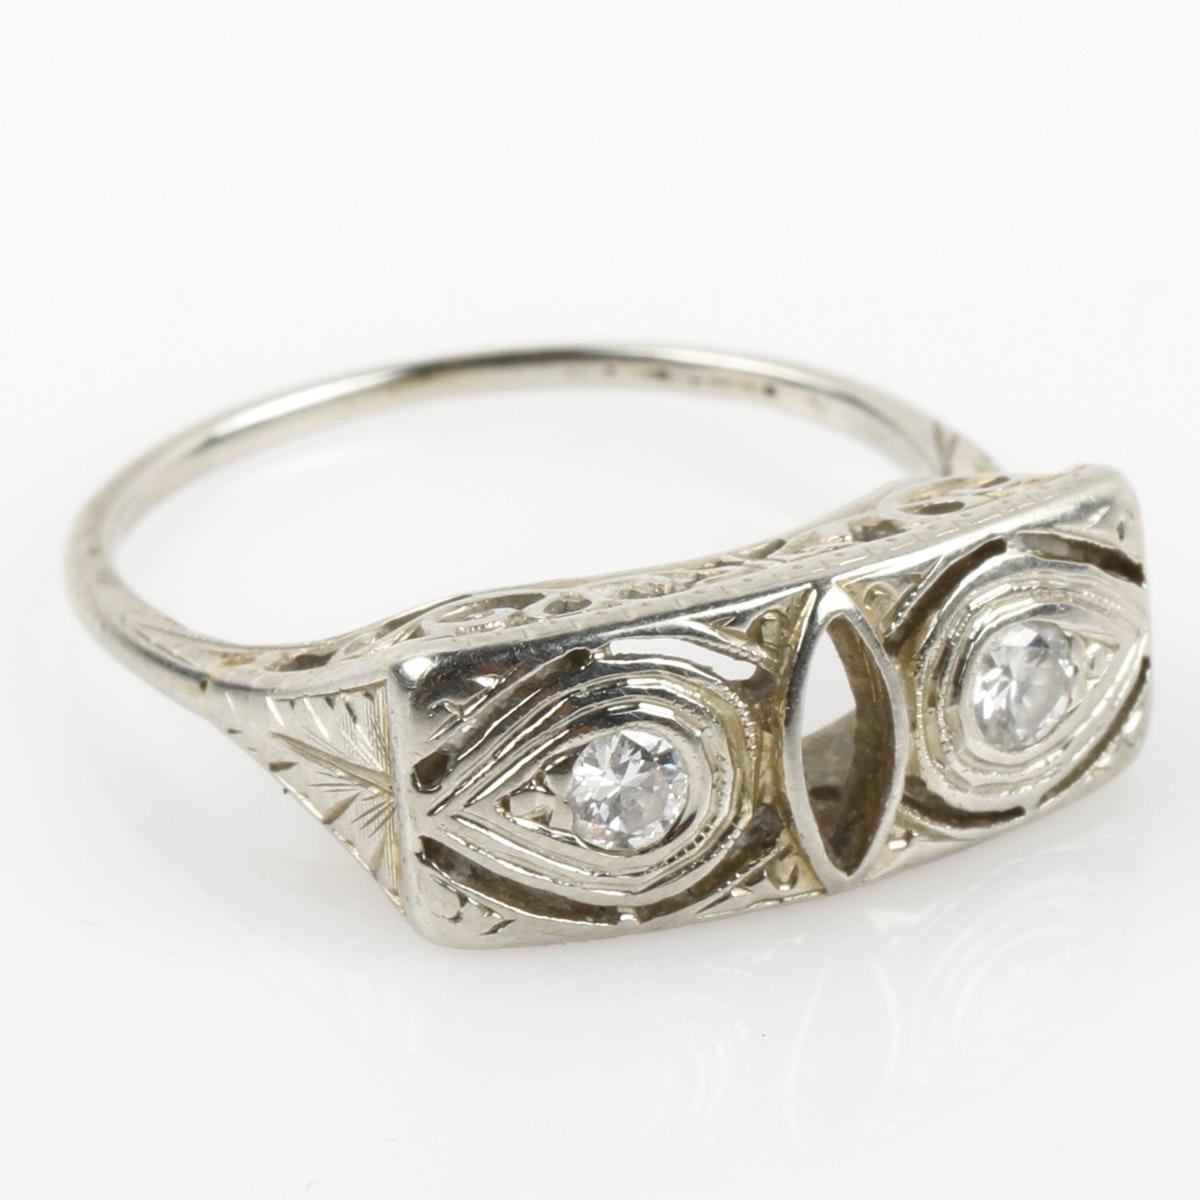 Edwardian 18K White Gold and Diamond Ring